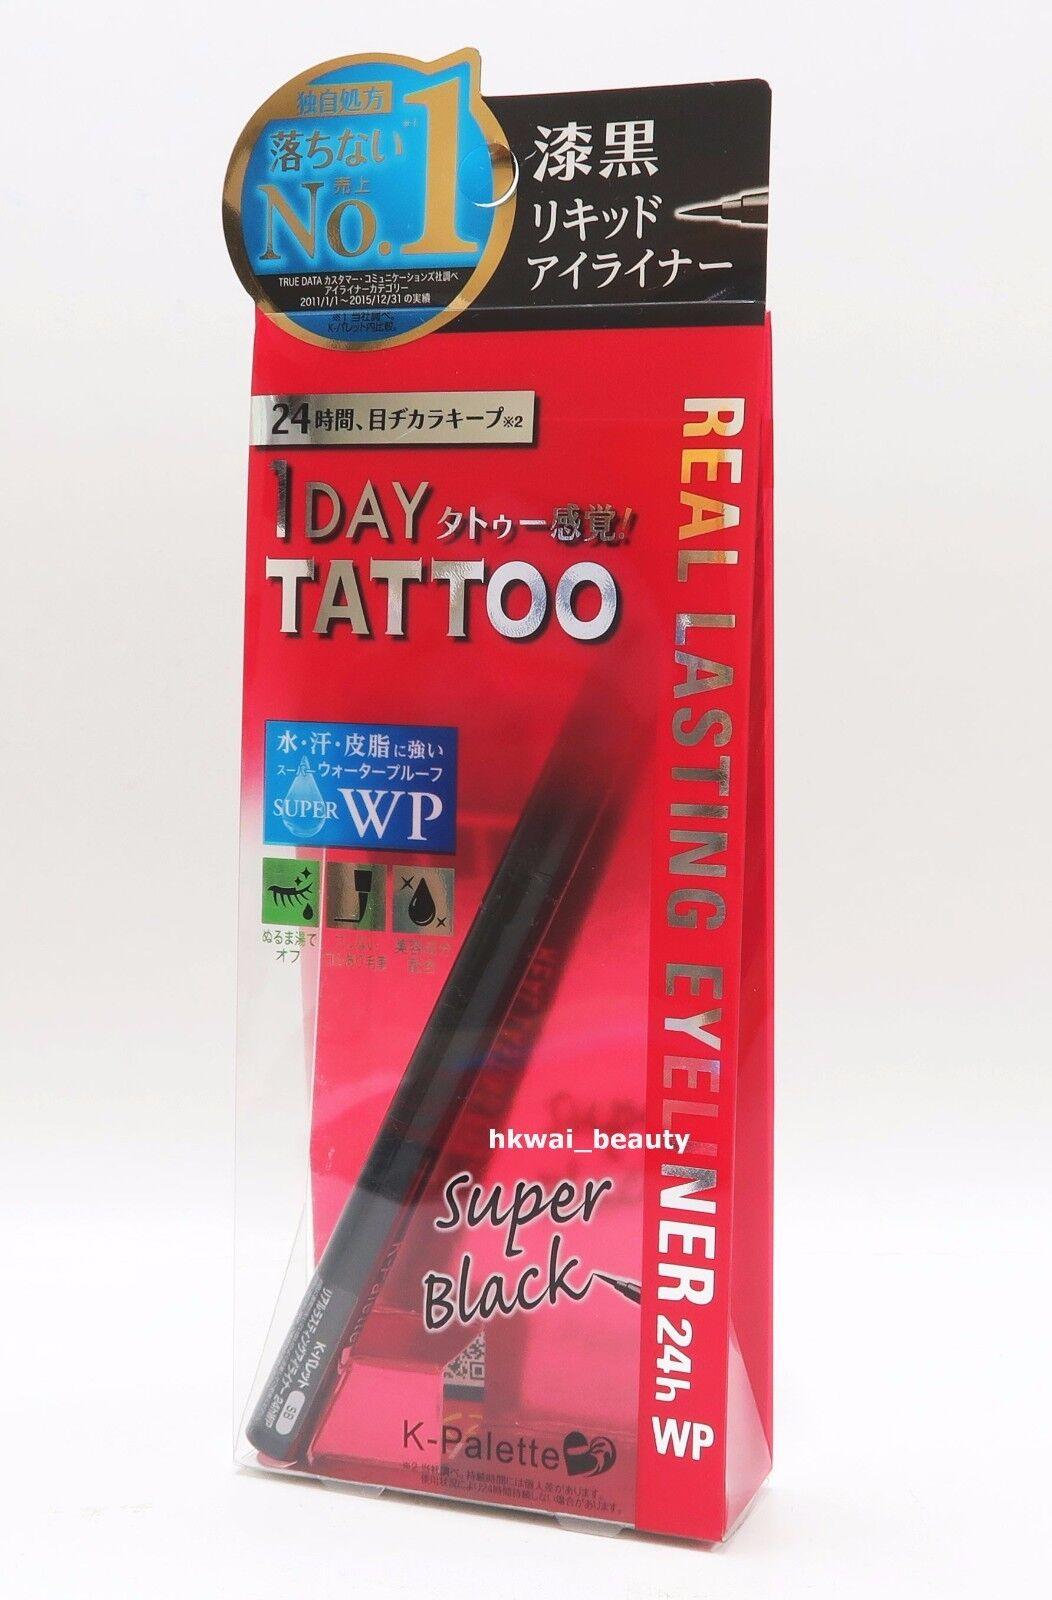 купить K Palette Japan 1 Day Tattoo Real Lasting Liquid на Ebaycom